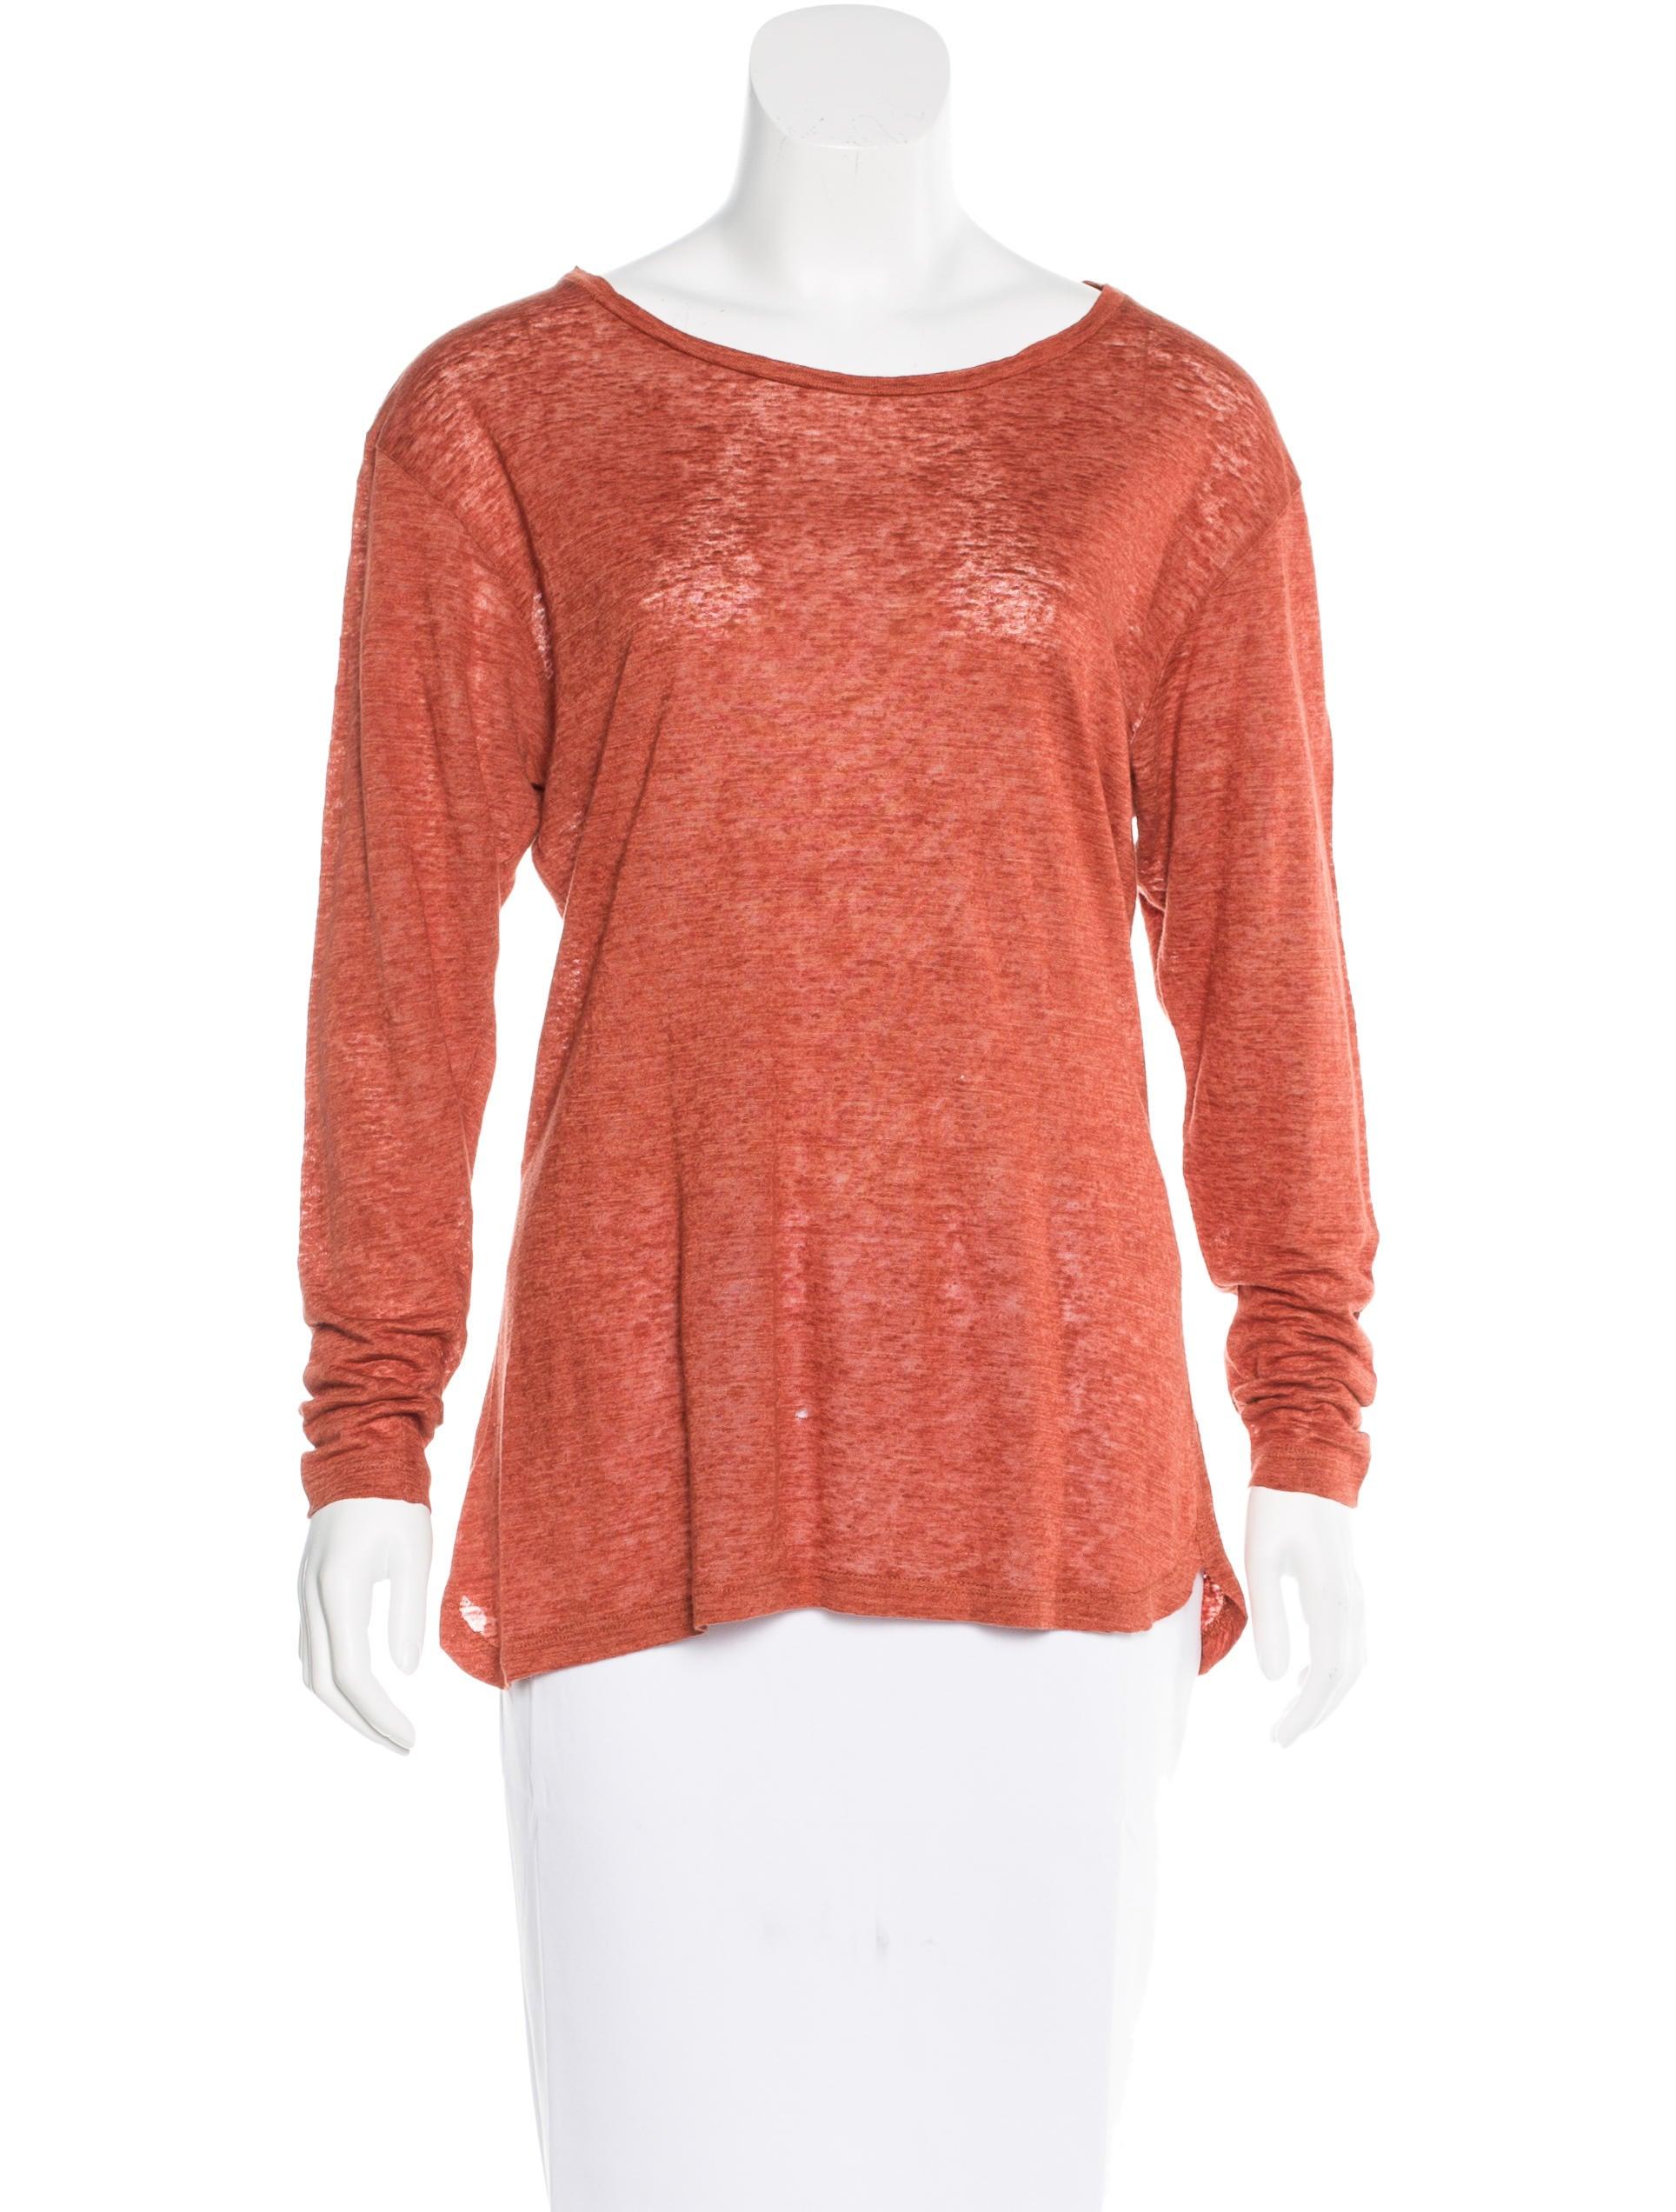 Isabel marant linen long sleeve t shirt clothing for Linen long sleeve shirt